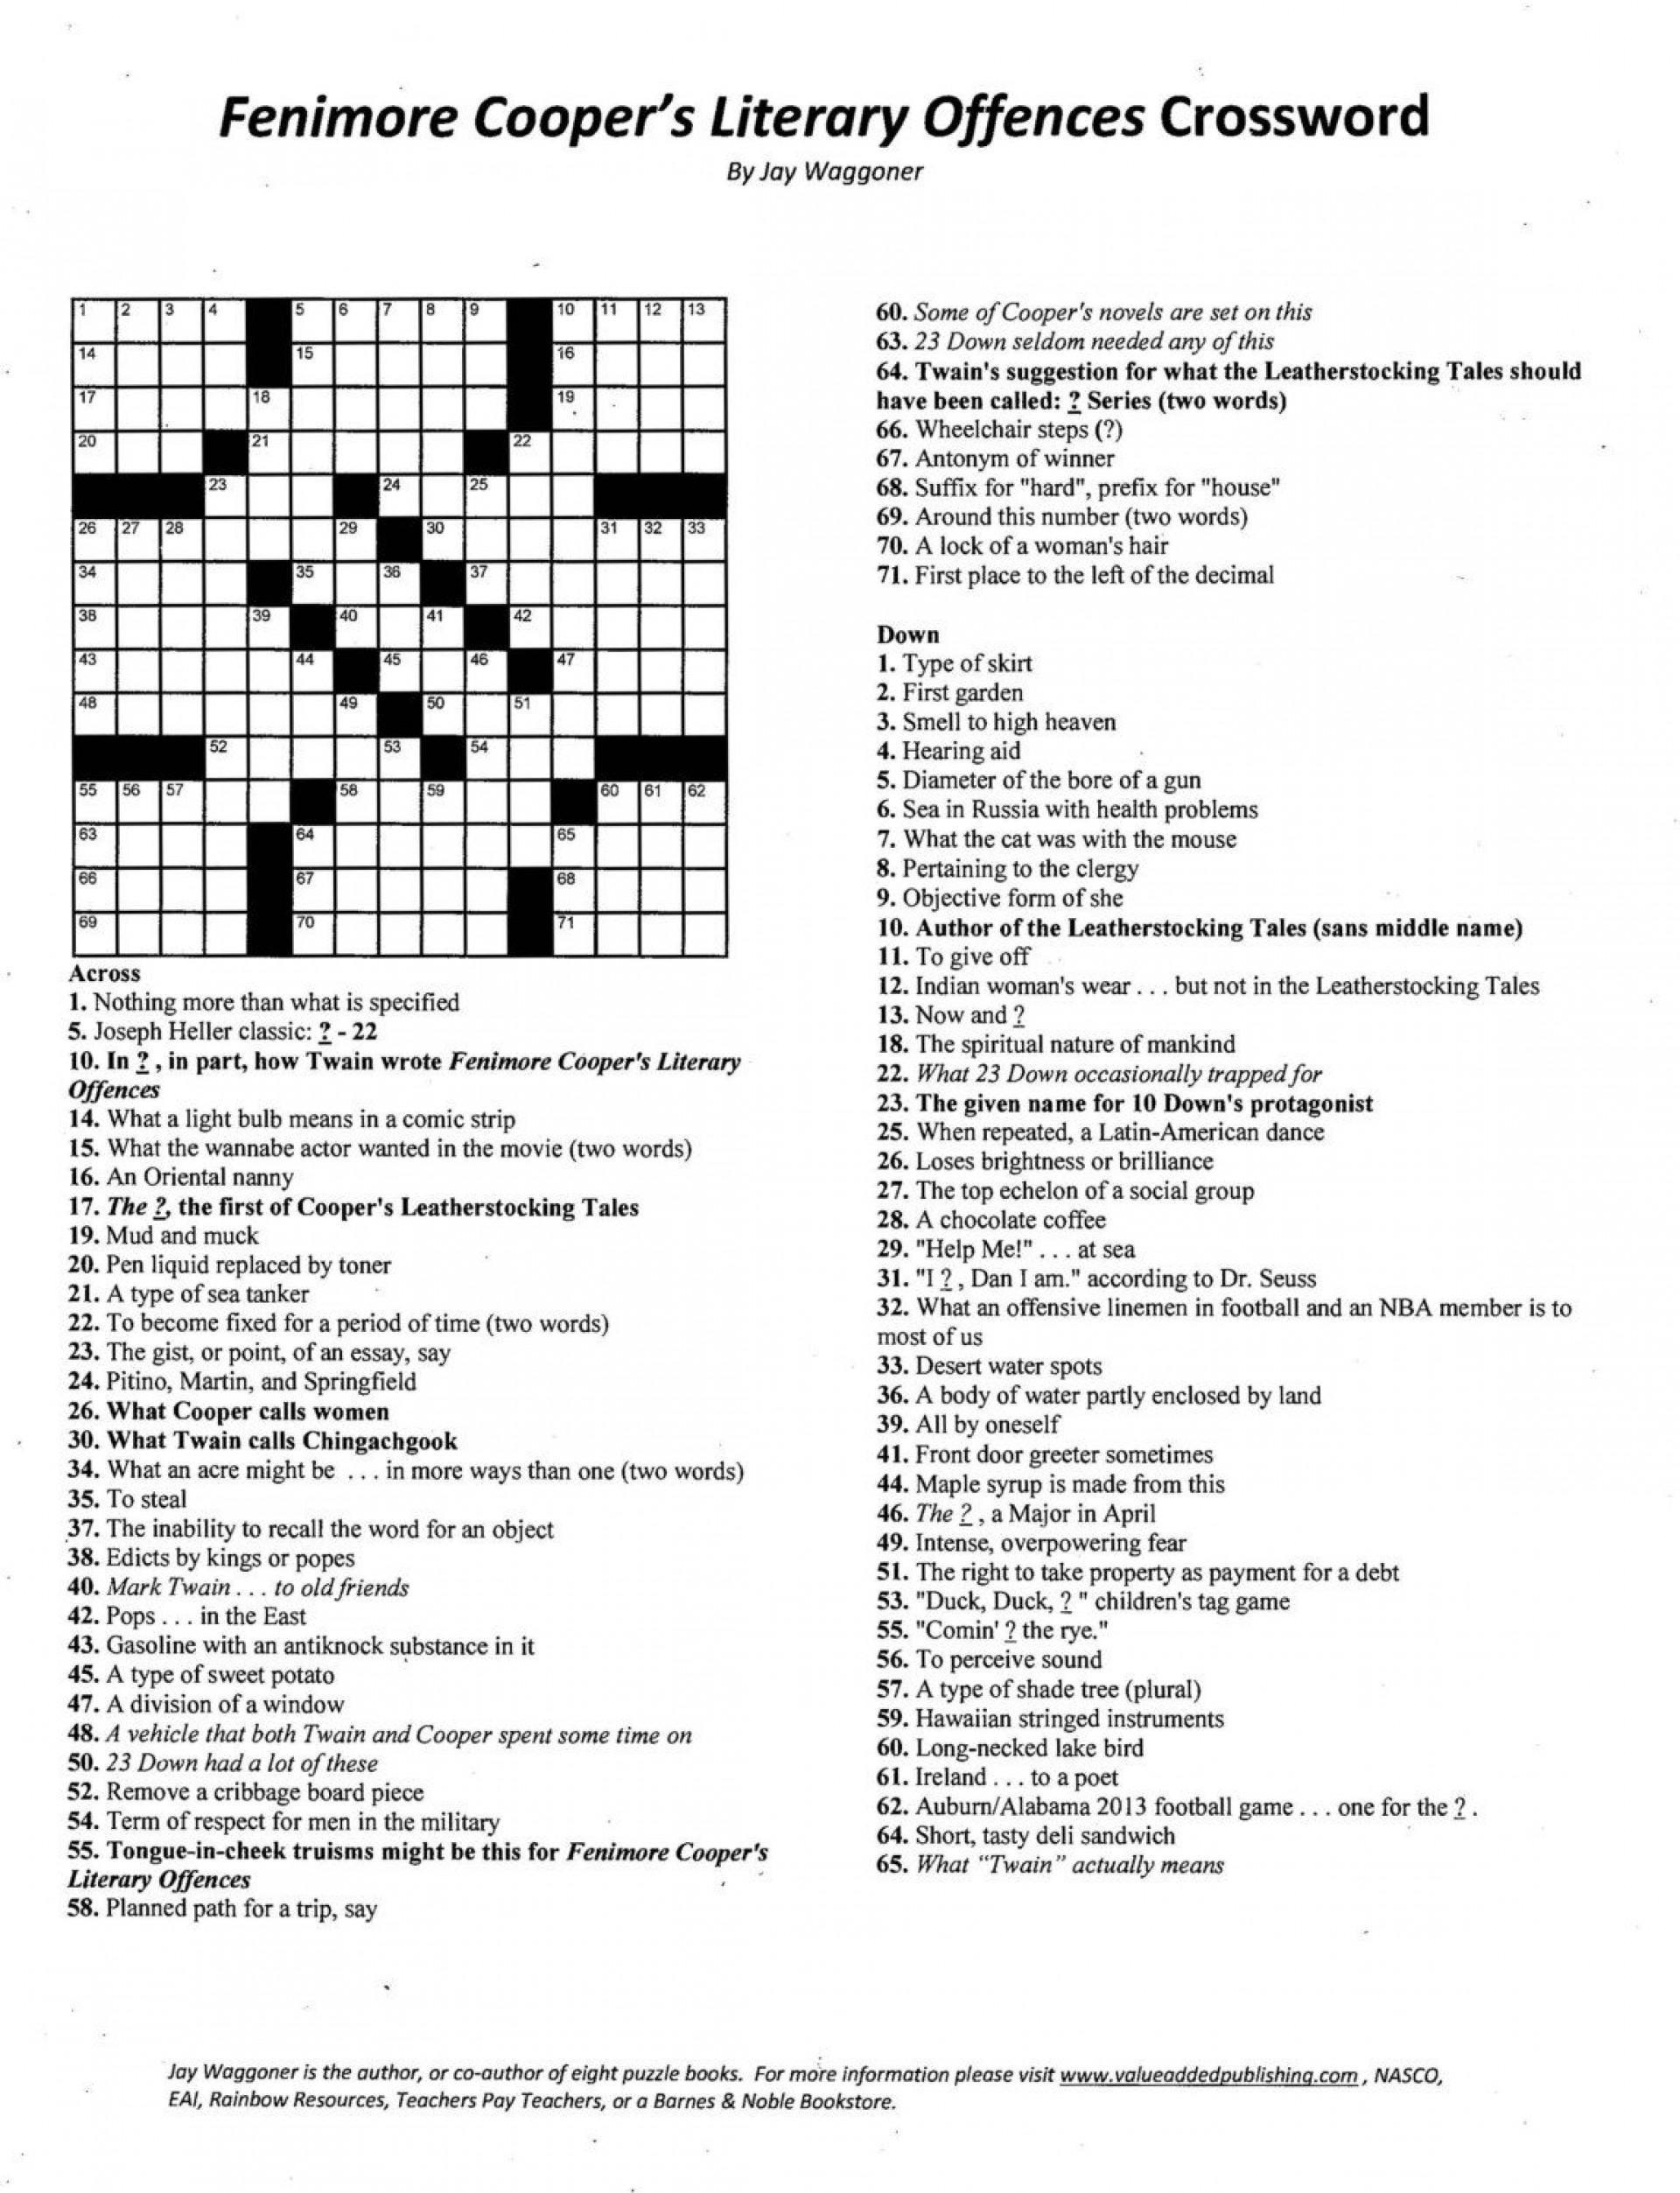 009 Essay Crossword Example Fascinating Byline Clue Short Puzzle Persuasive 1920